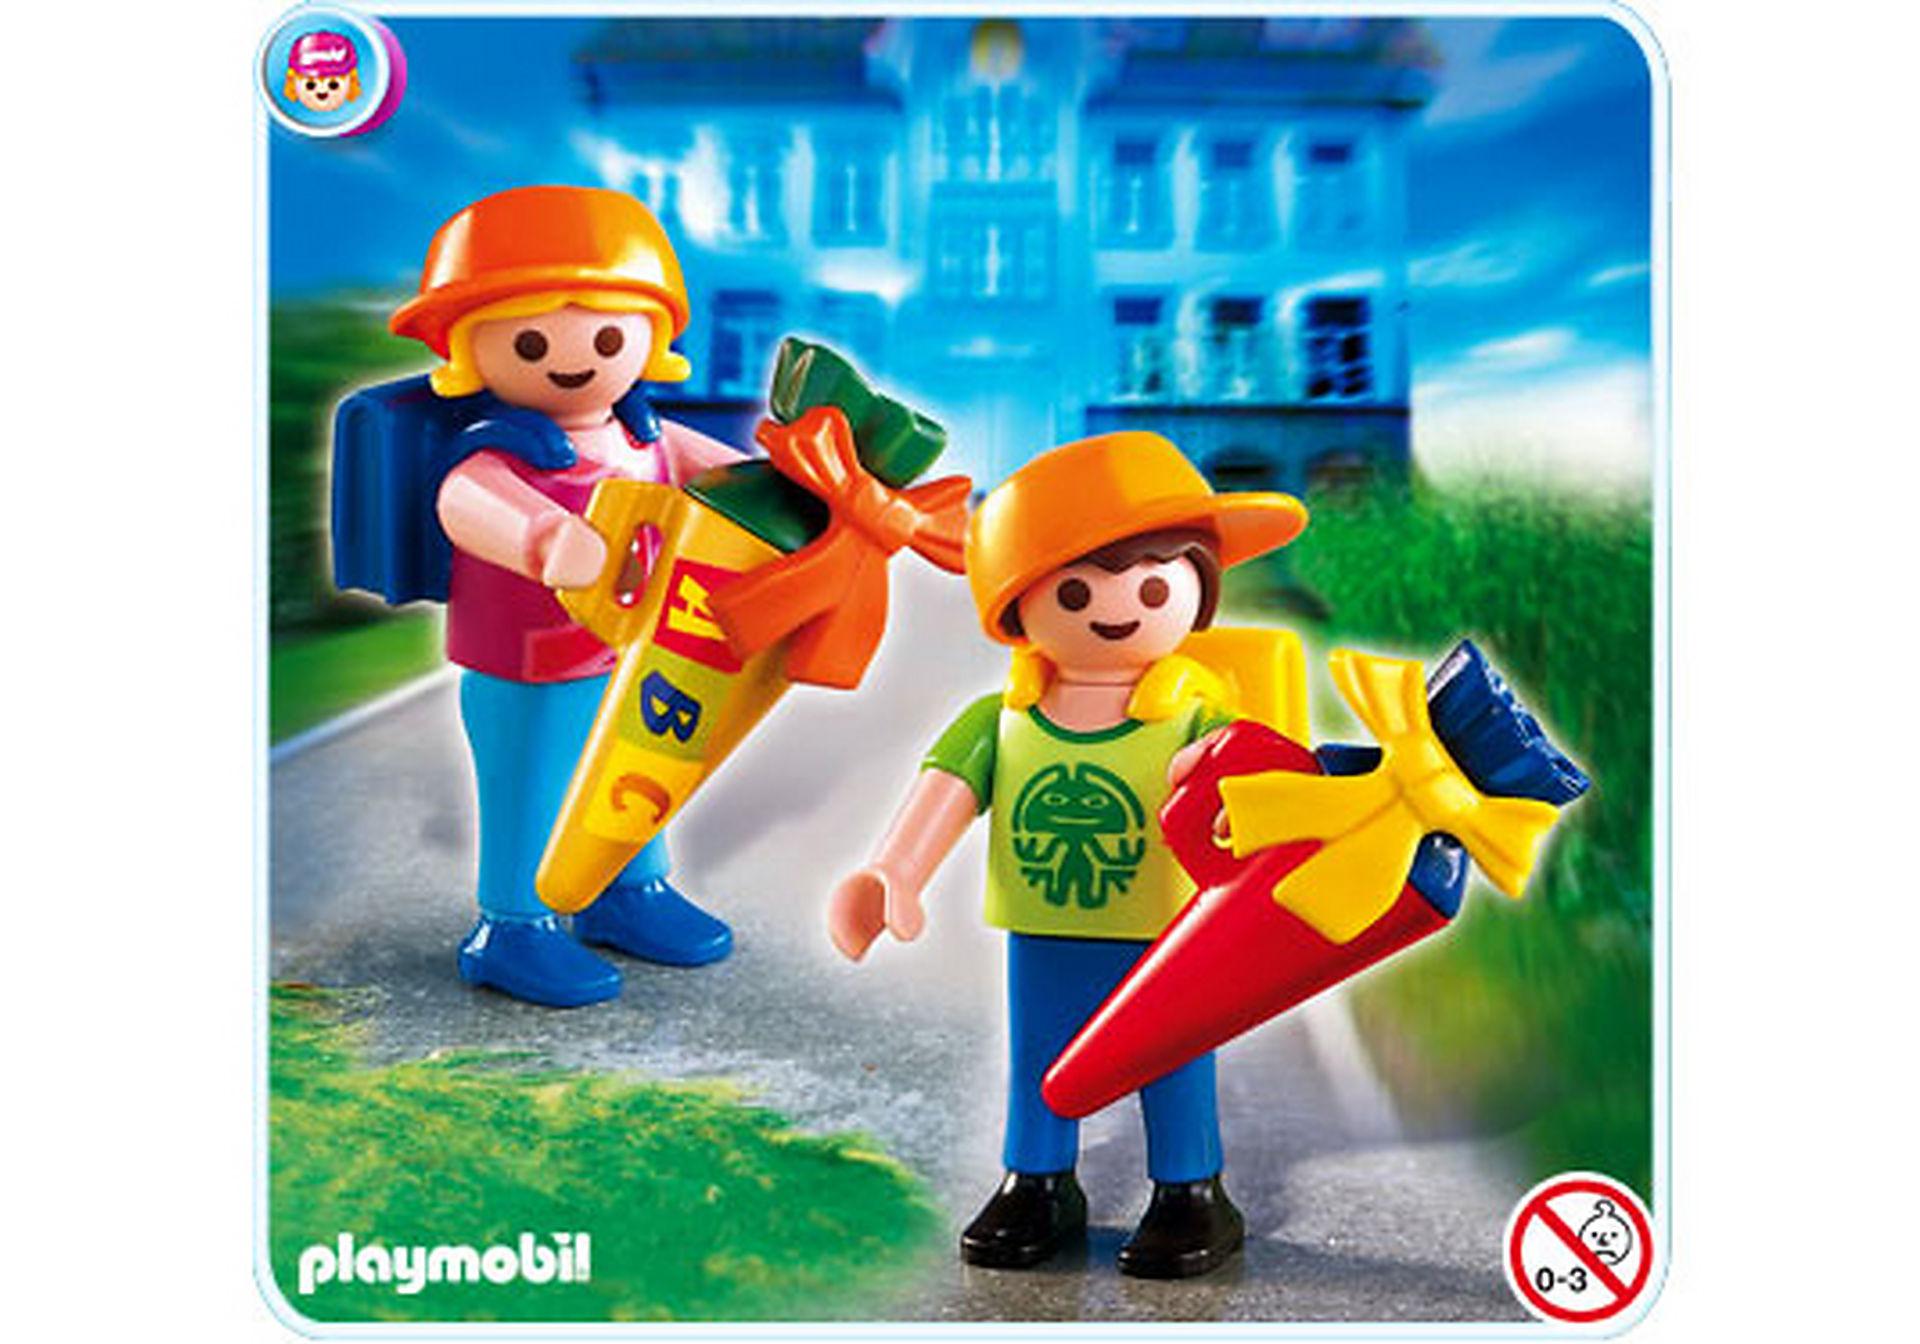 http://media.playmobil.com/i/playmobil/4686-A_product_detail/ABC-Schützen